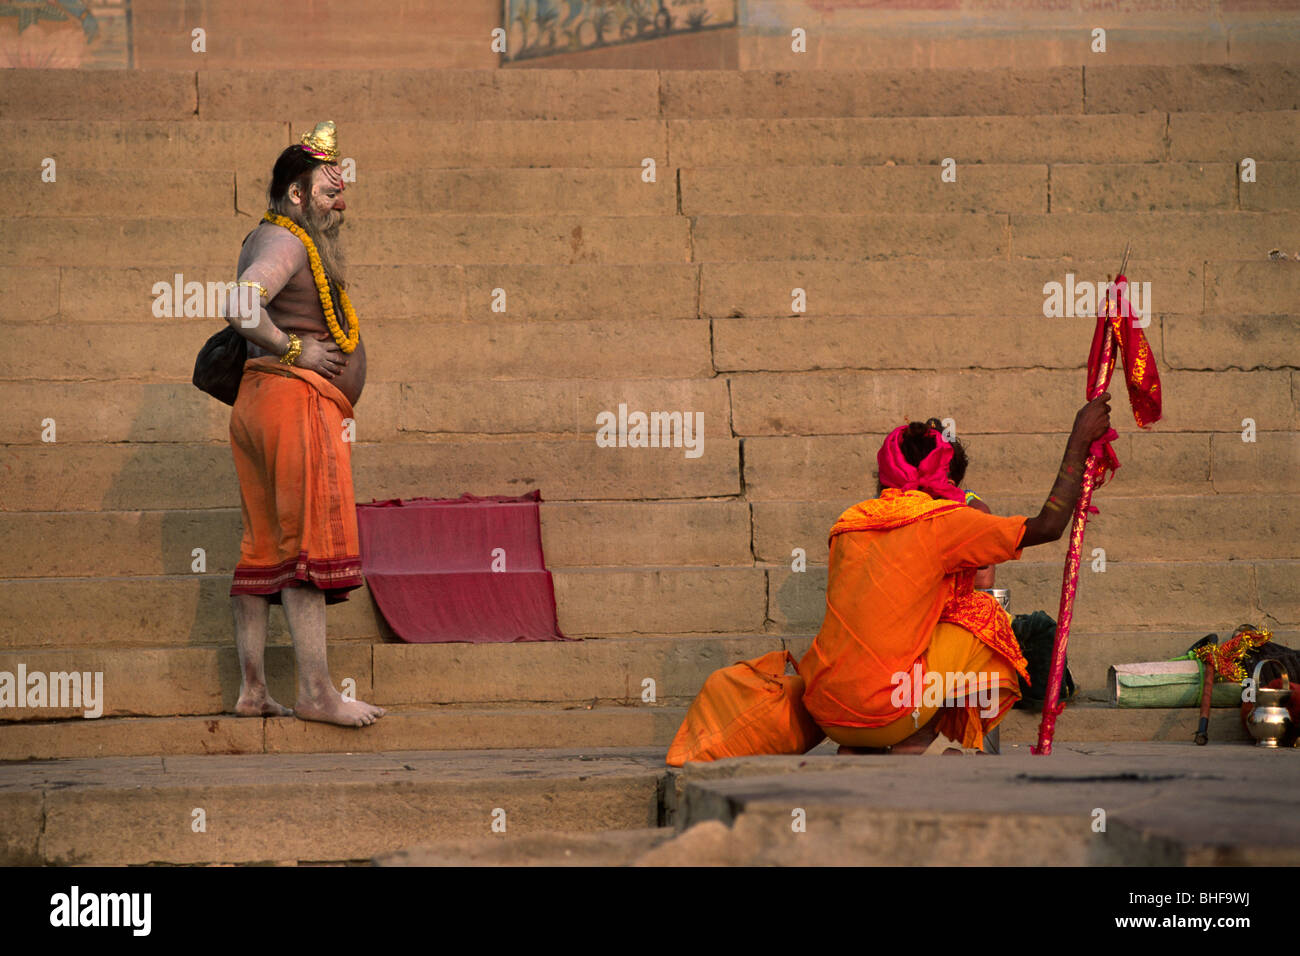 india, varanasi, sadhu - Stock Image